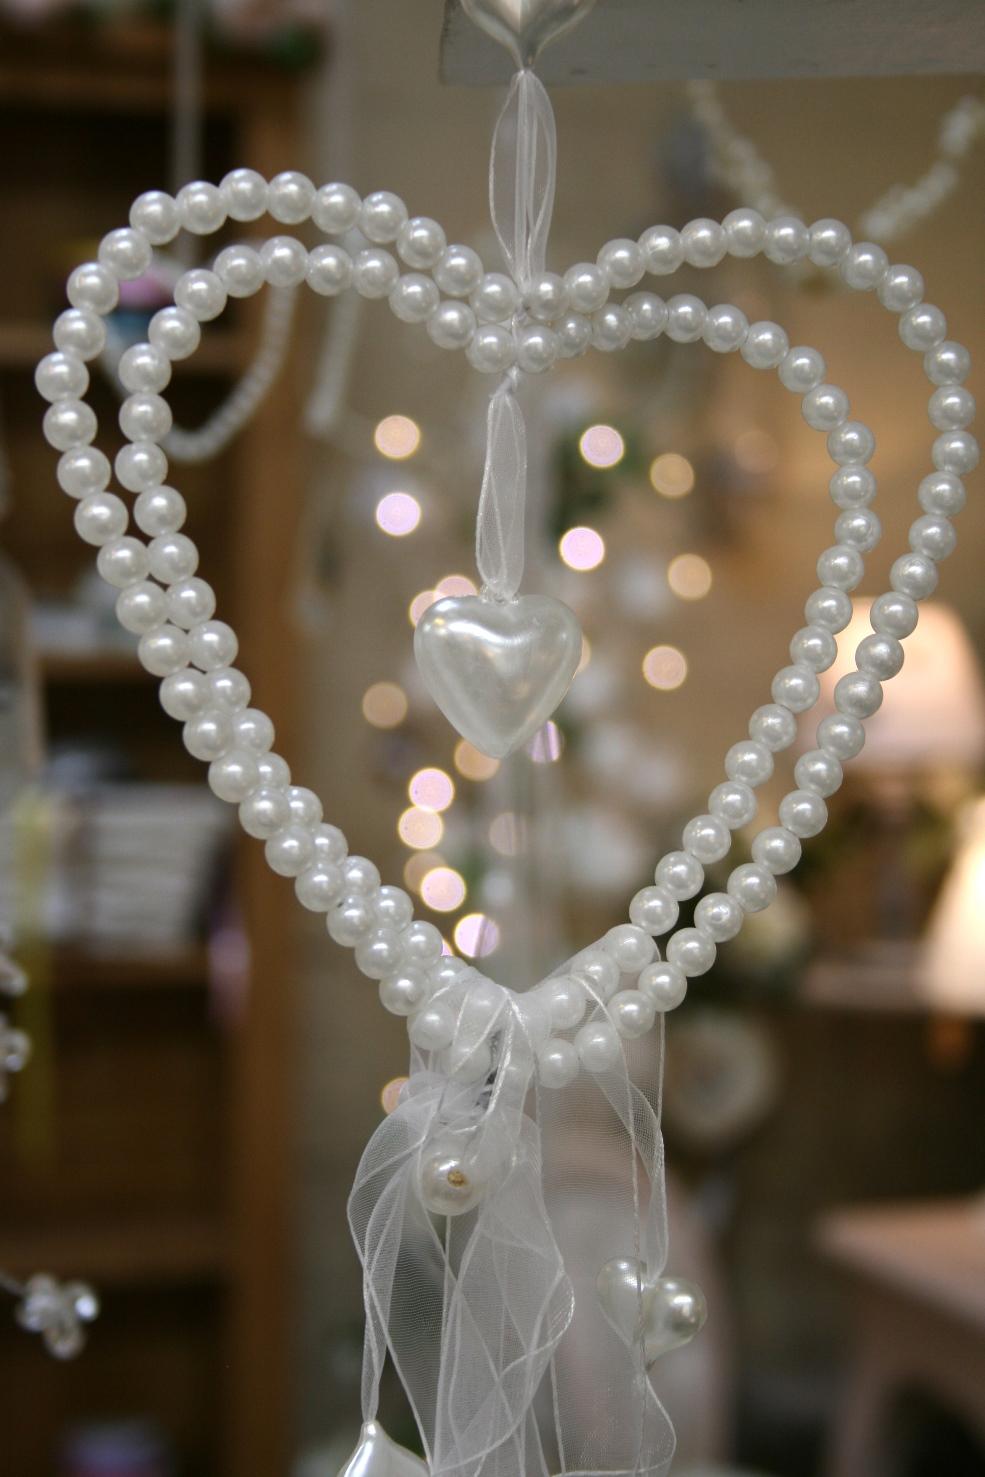 Hanging Heart Decoration - €7.00